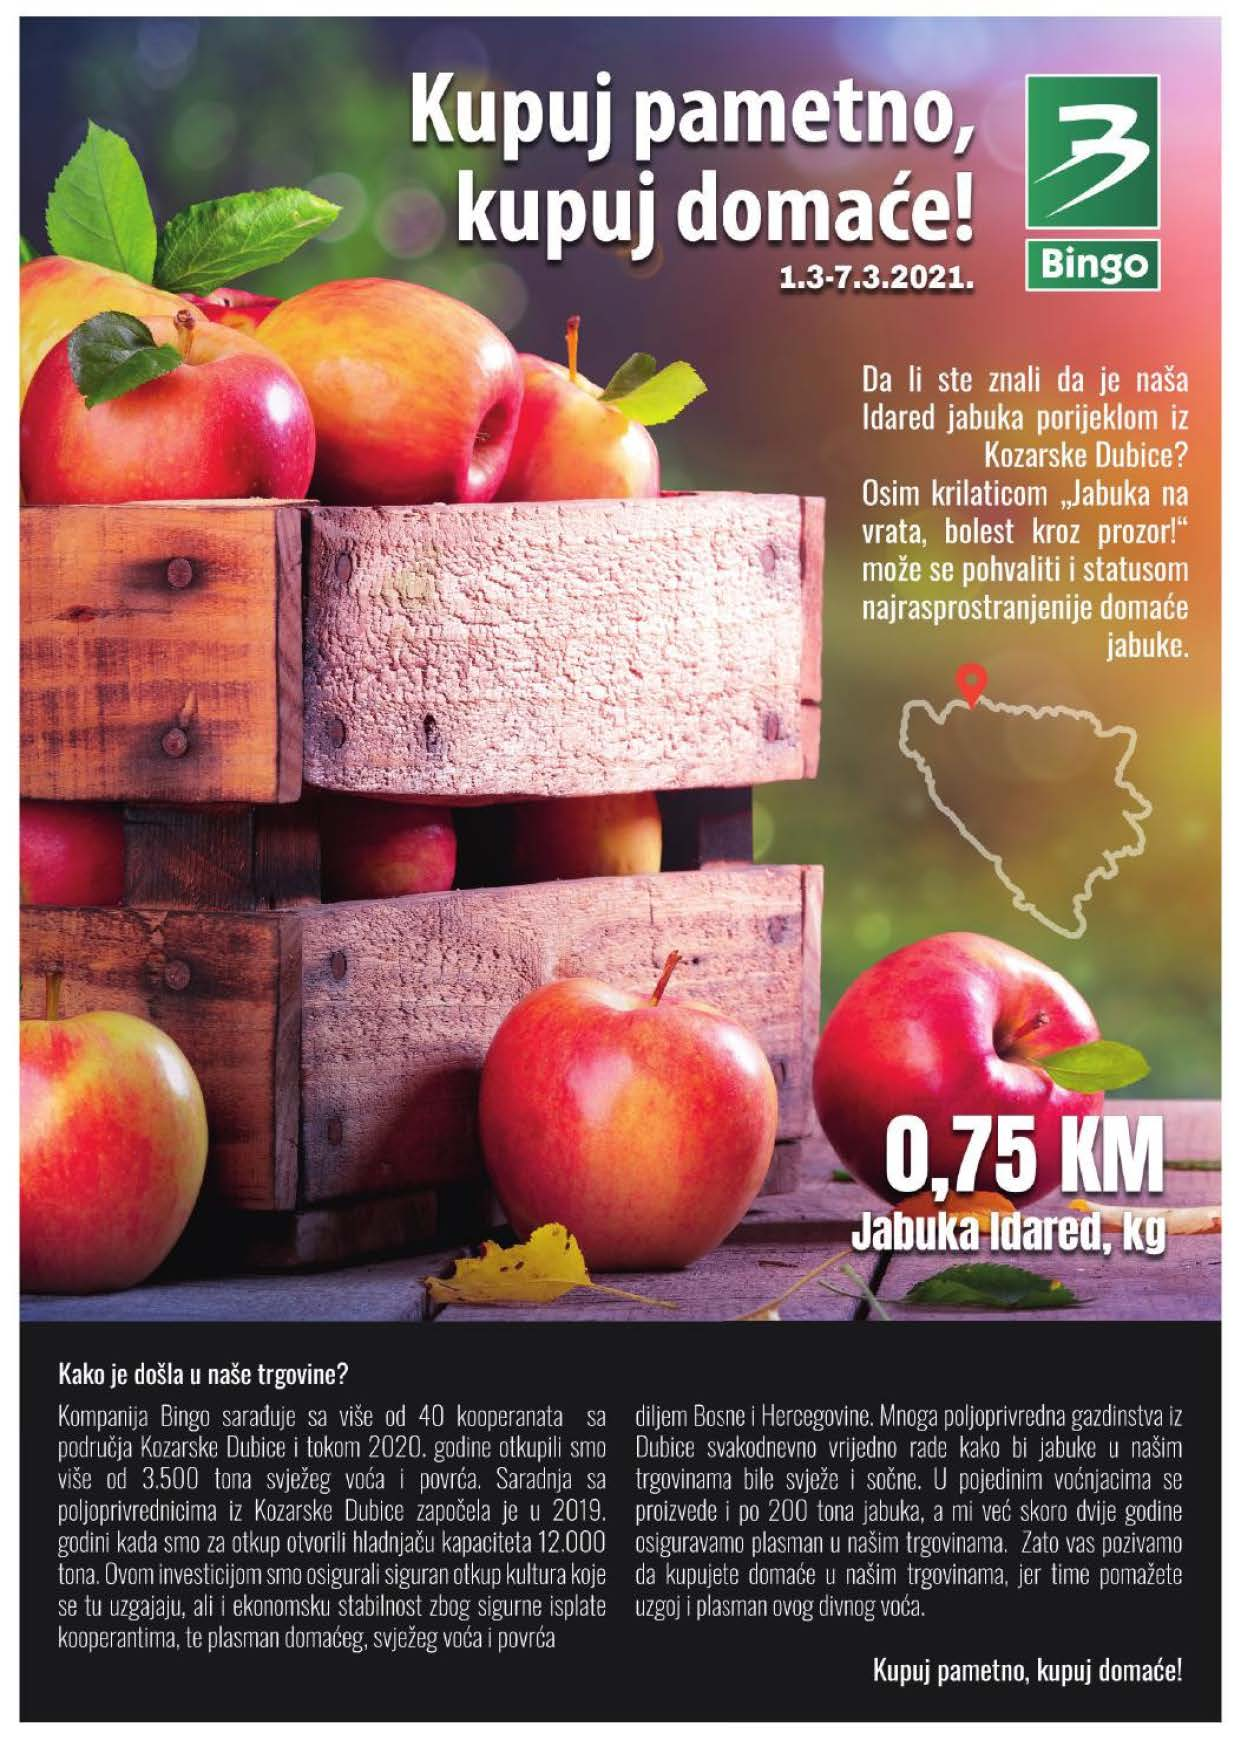 BINGO Katalog Kupuj domace MART 2021 01.03.2021. 07.01.2021. Page 1